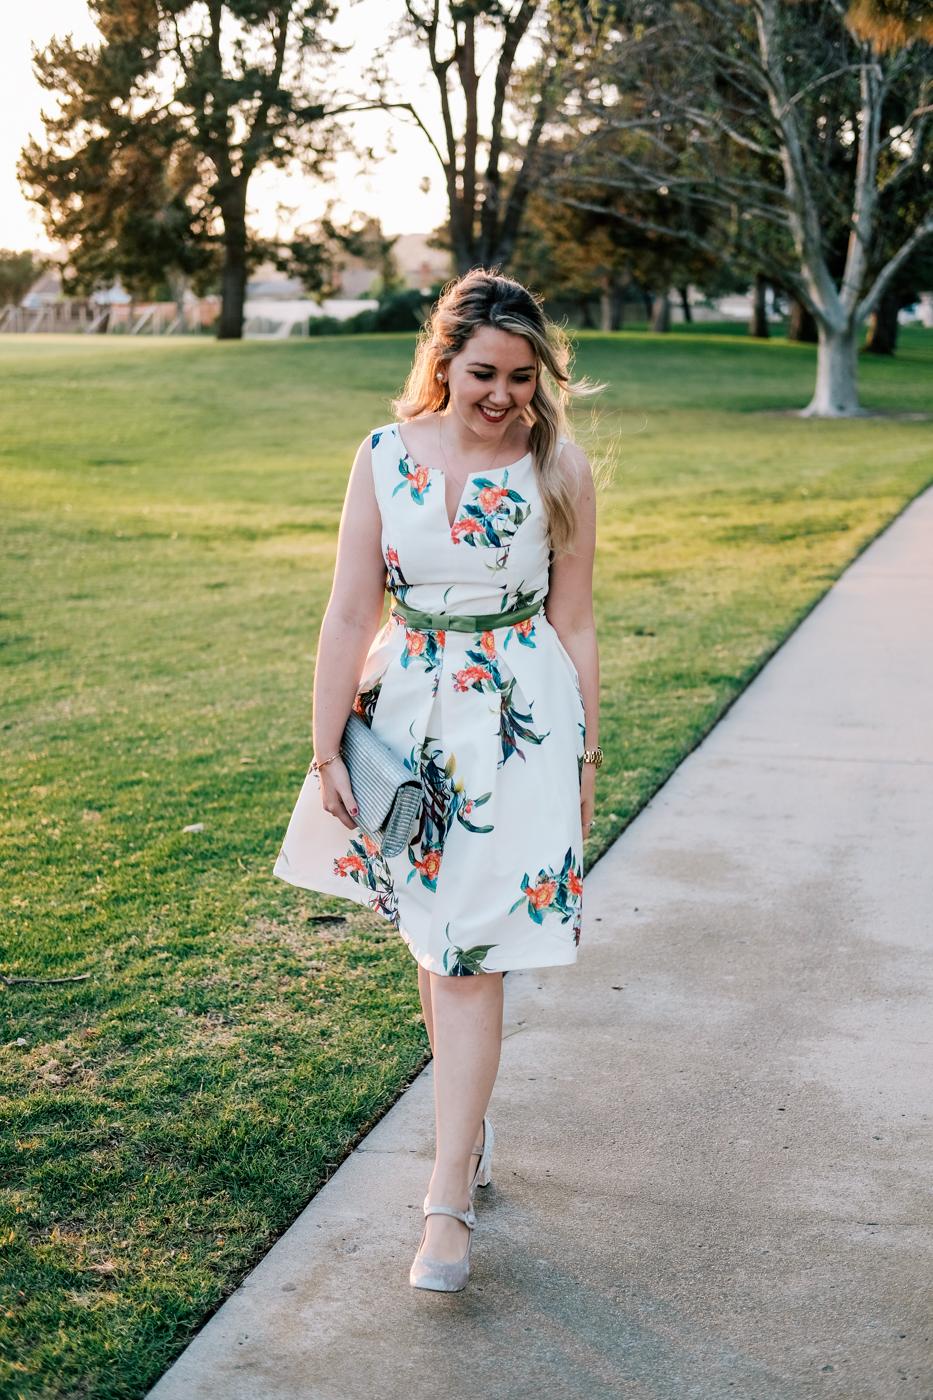 Debora Dahl, Deborah Dahl spring style floral dress